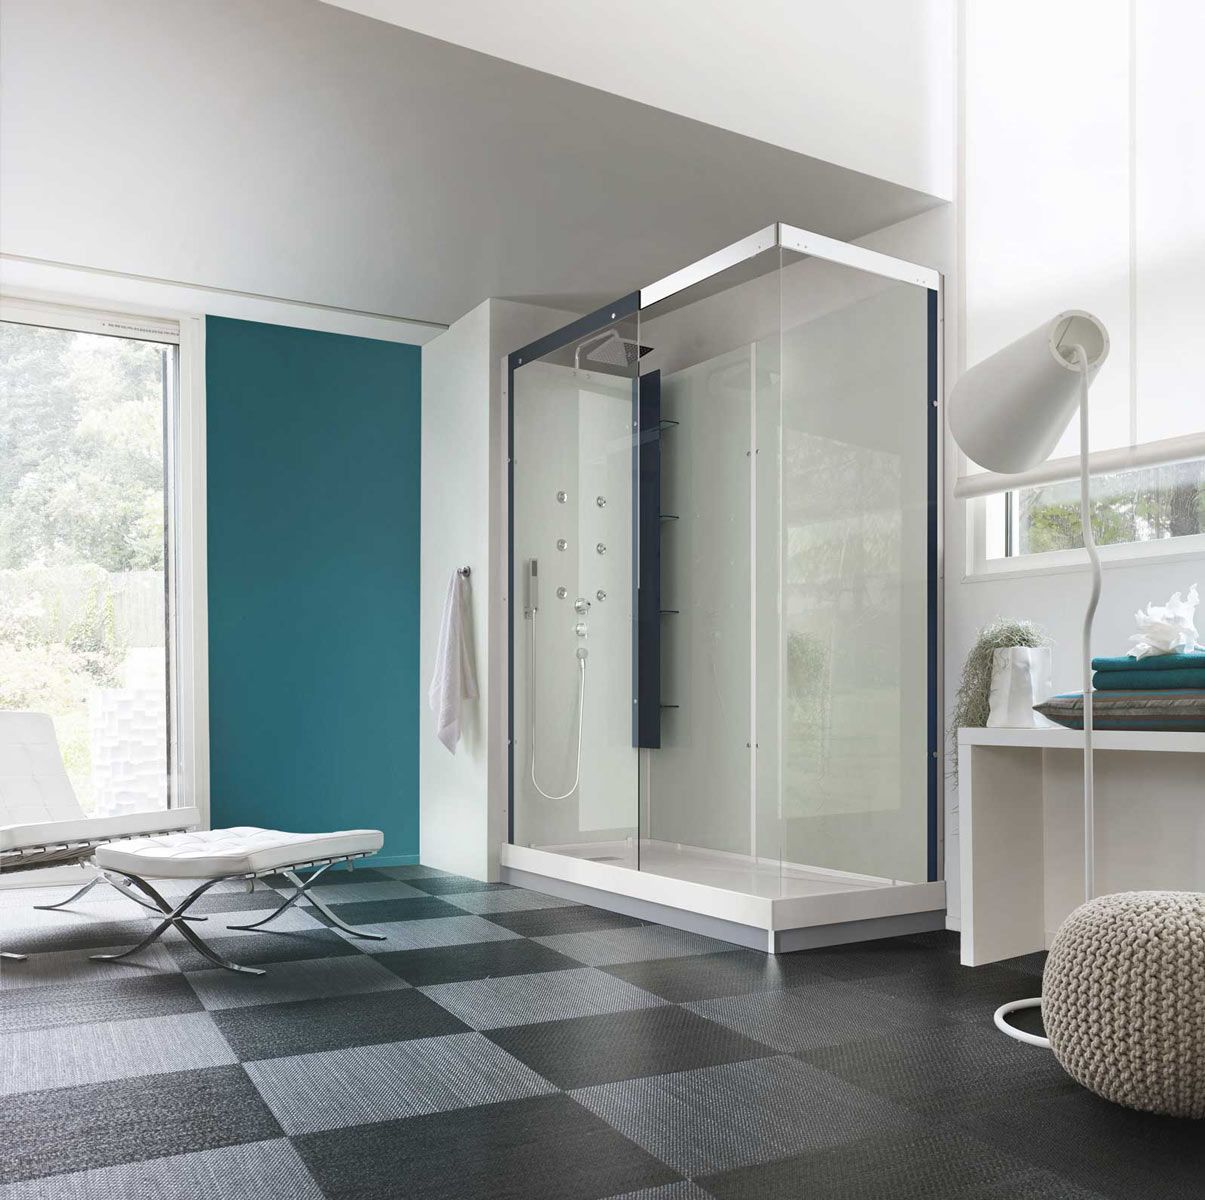 Cabine de douche intégrale Kinedo Horizon | Espace Aubade | Home ...